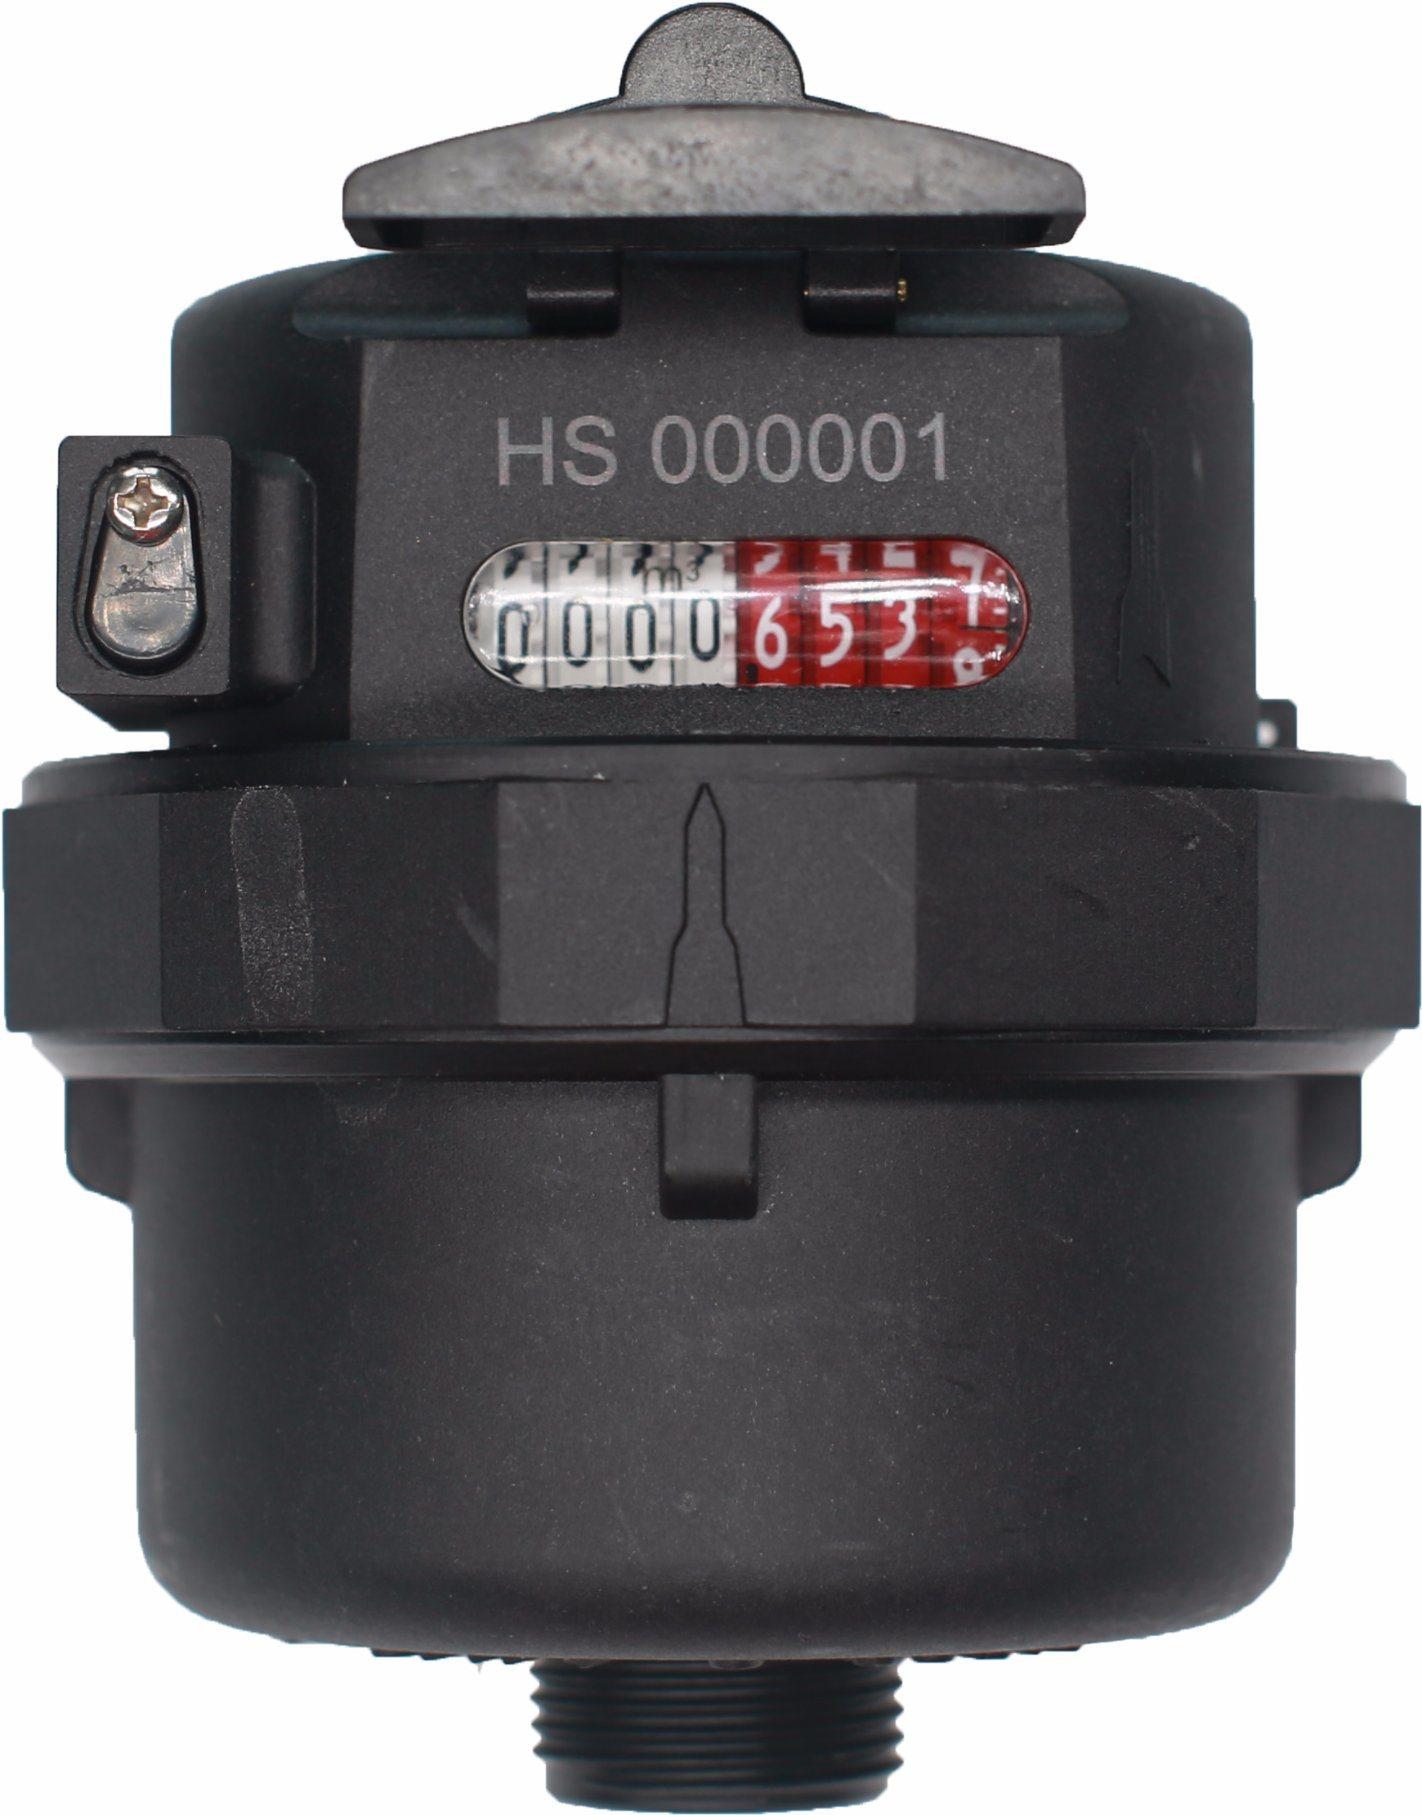 Wet Type Plastic Body Volumetric Water Meter (LXH-15S)